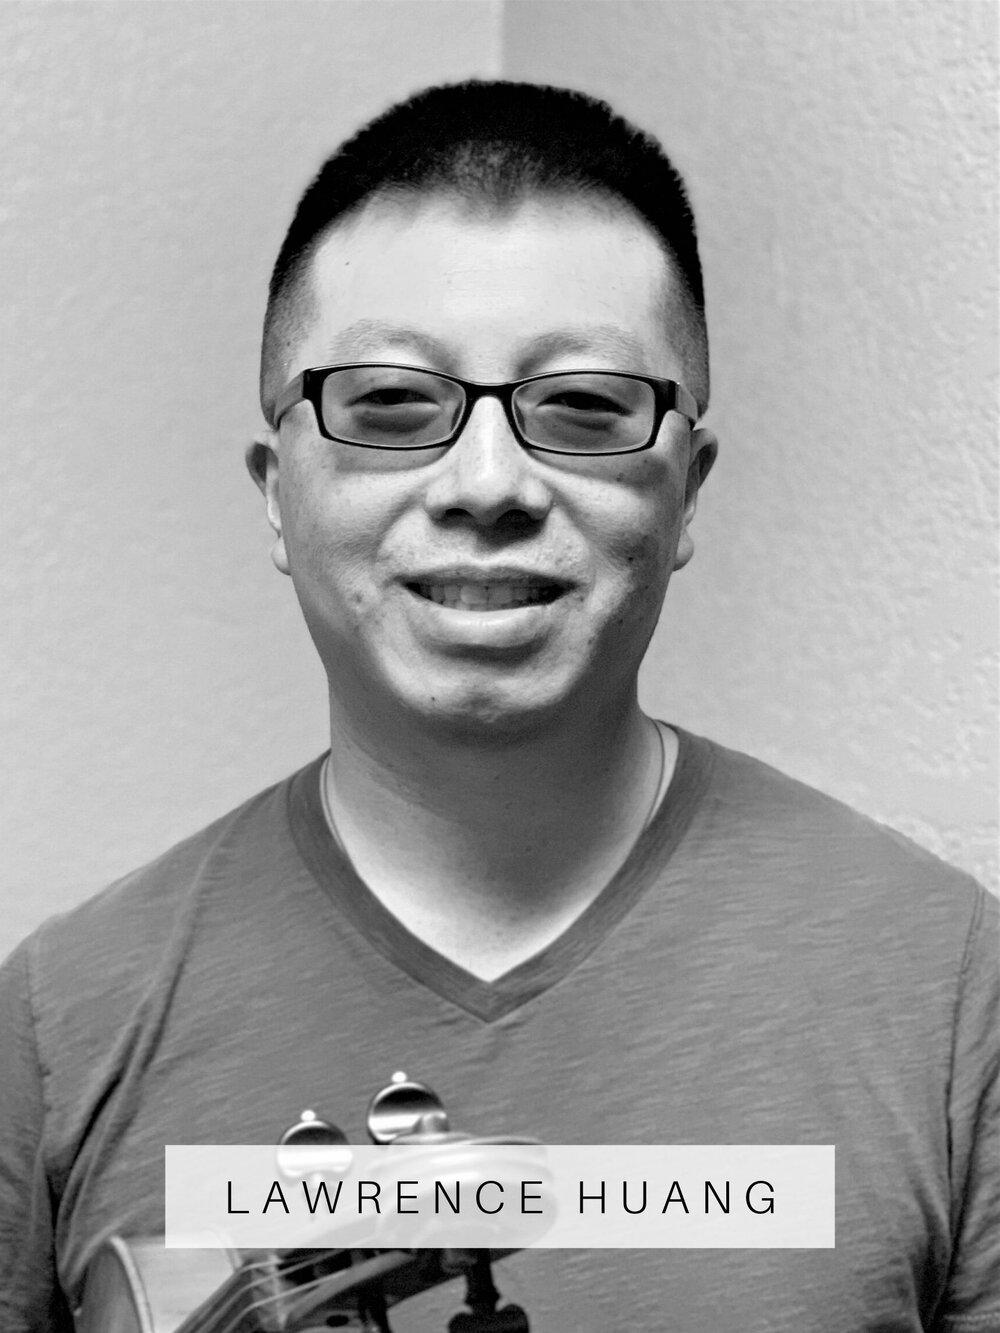 Lawrence Huang